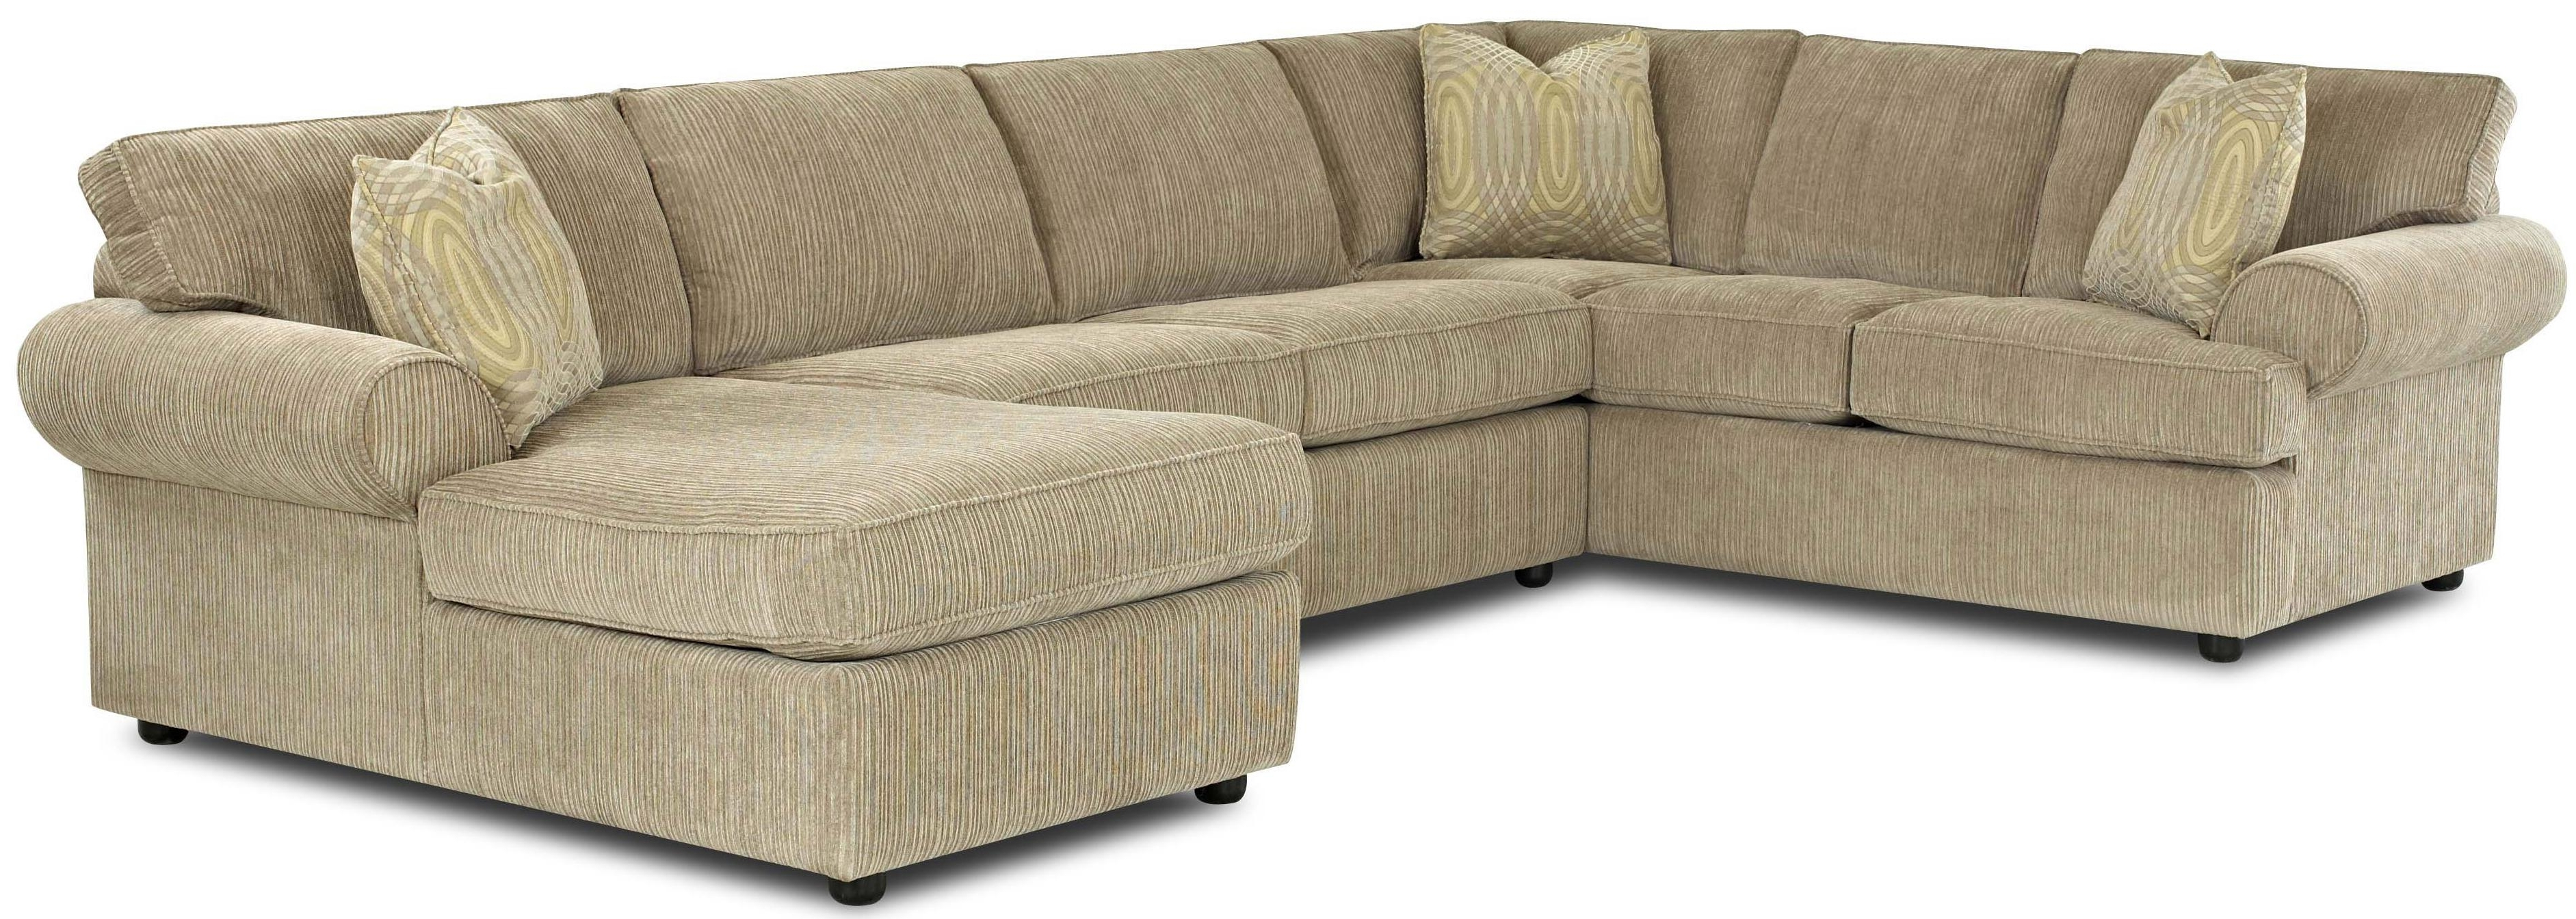 2018 Sectional Sofa Design: Amazing Chaise Sofa Sectional Sectional With Regard To Sectional Chaises (View 1 of 15)